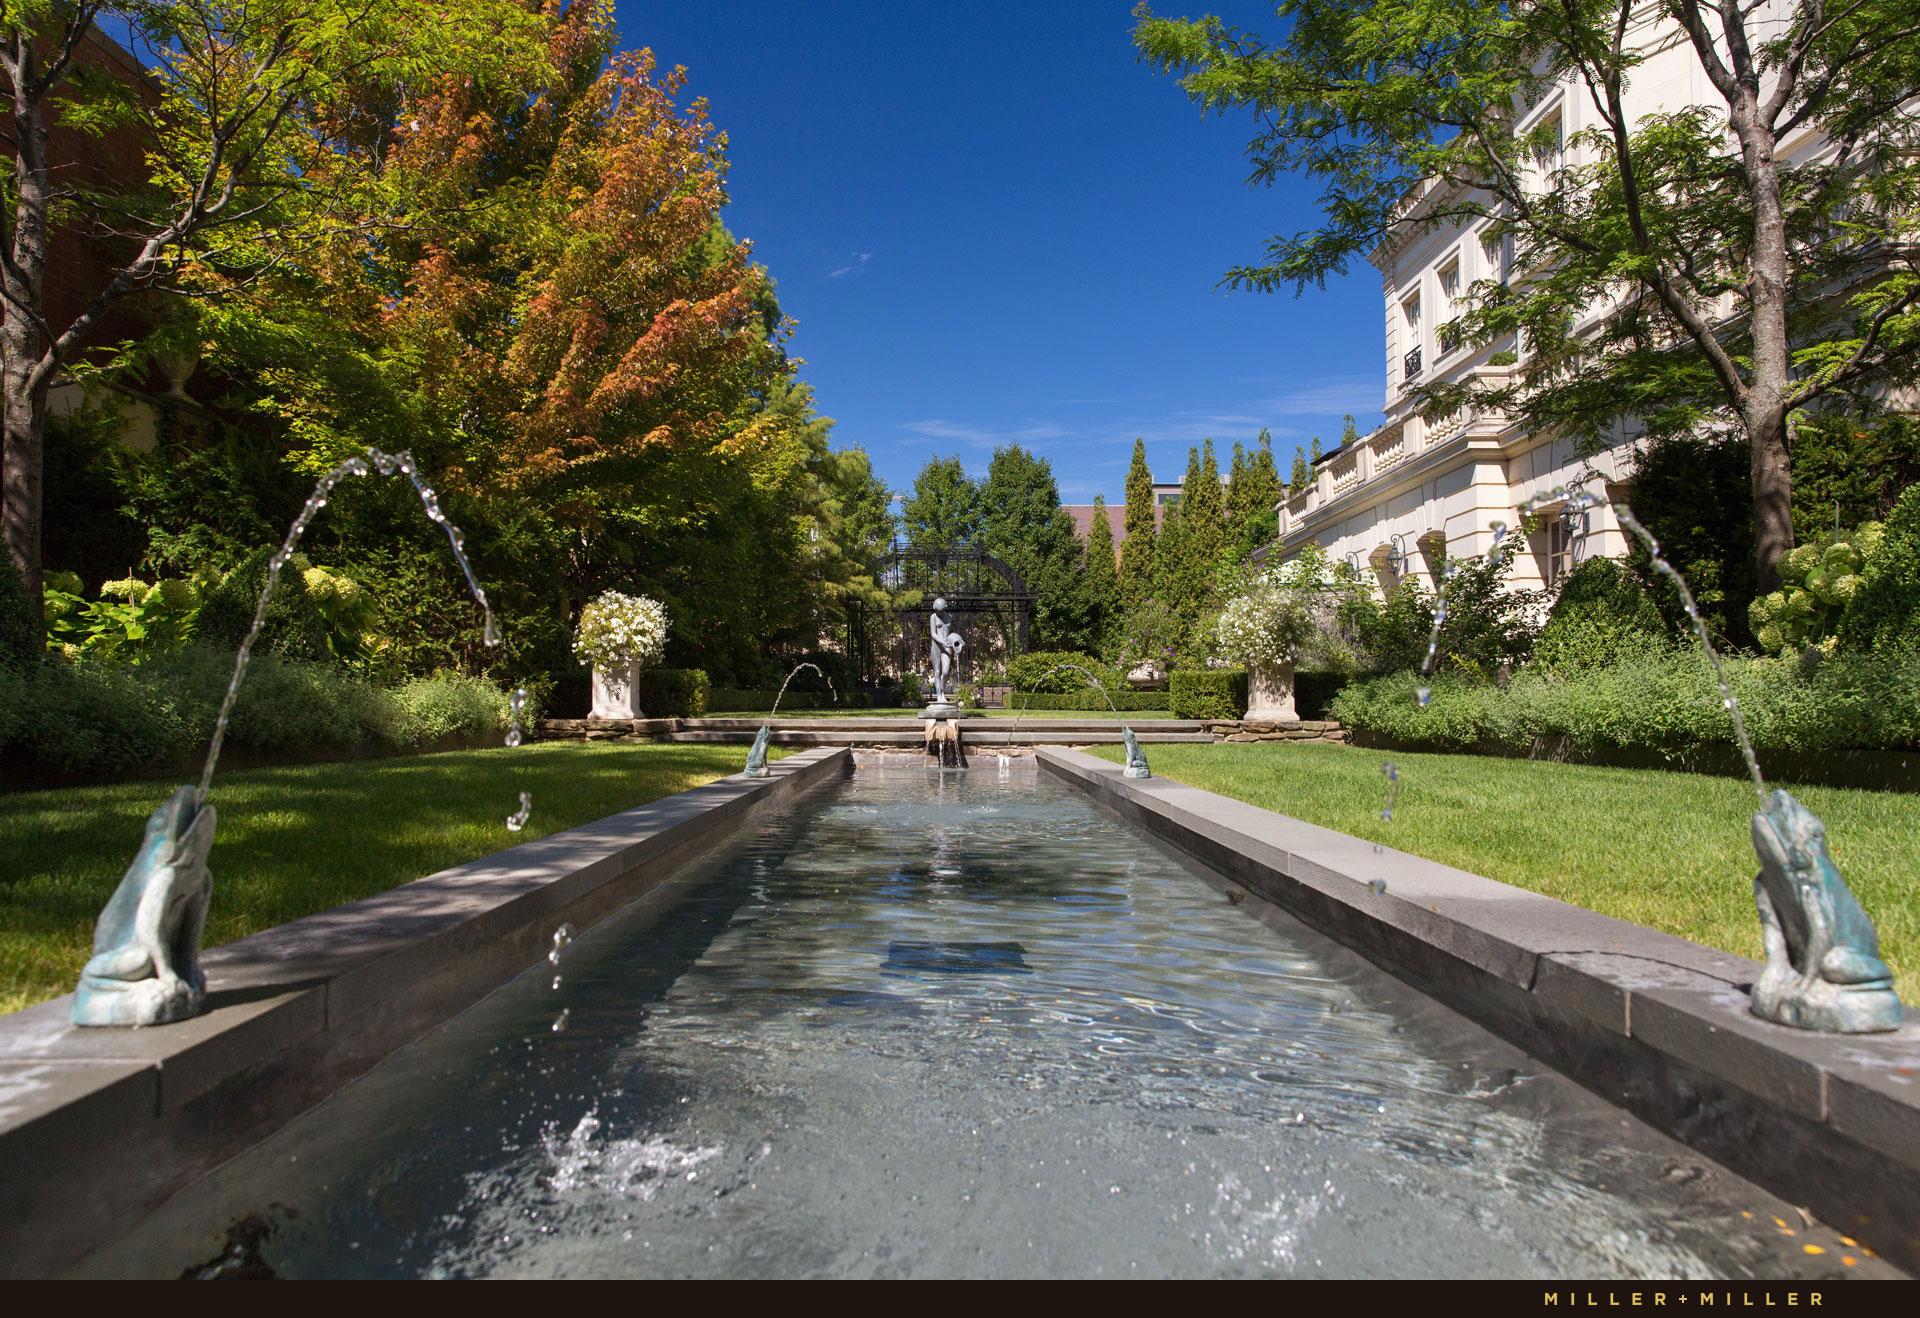 1932-burling-backyard-reflection-pool-fountains